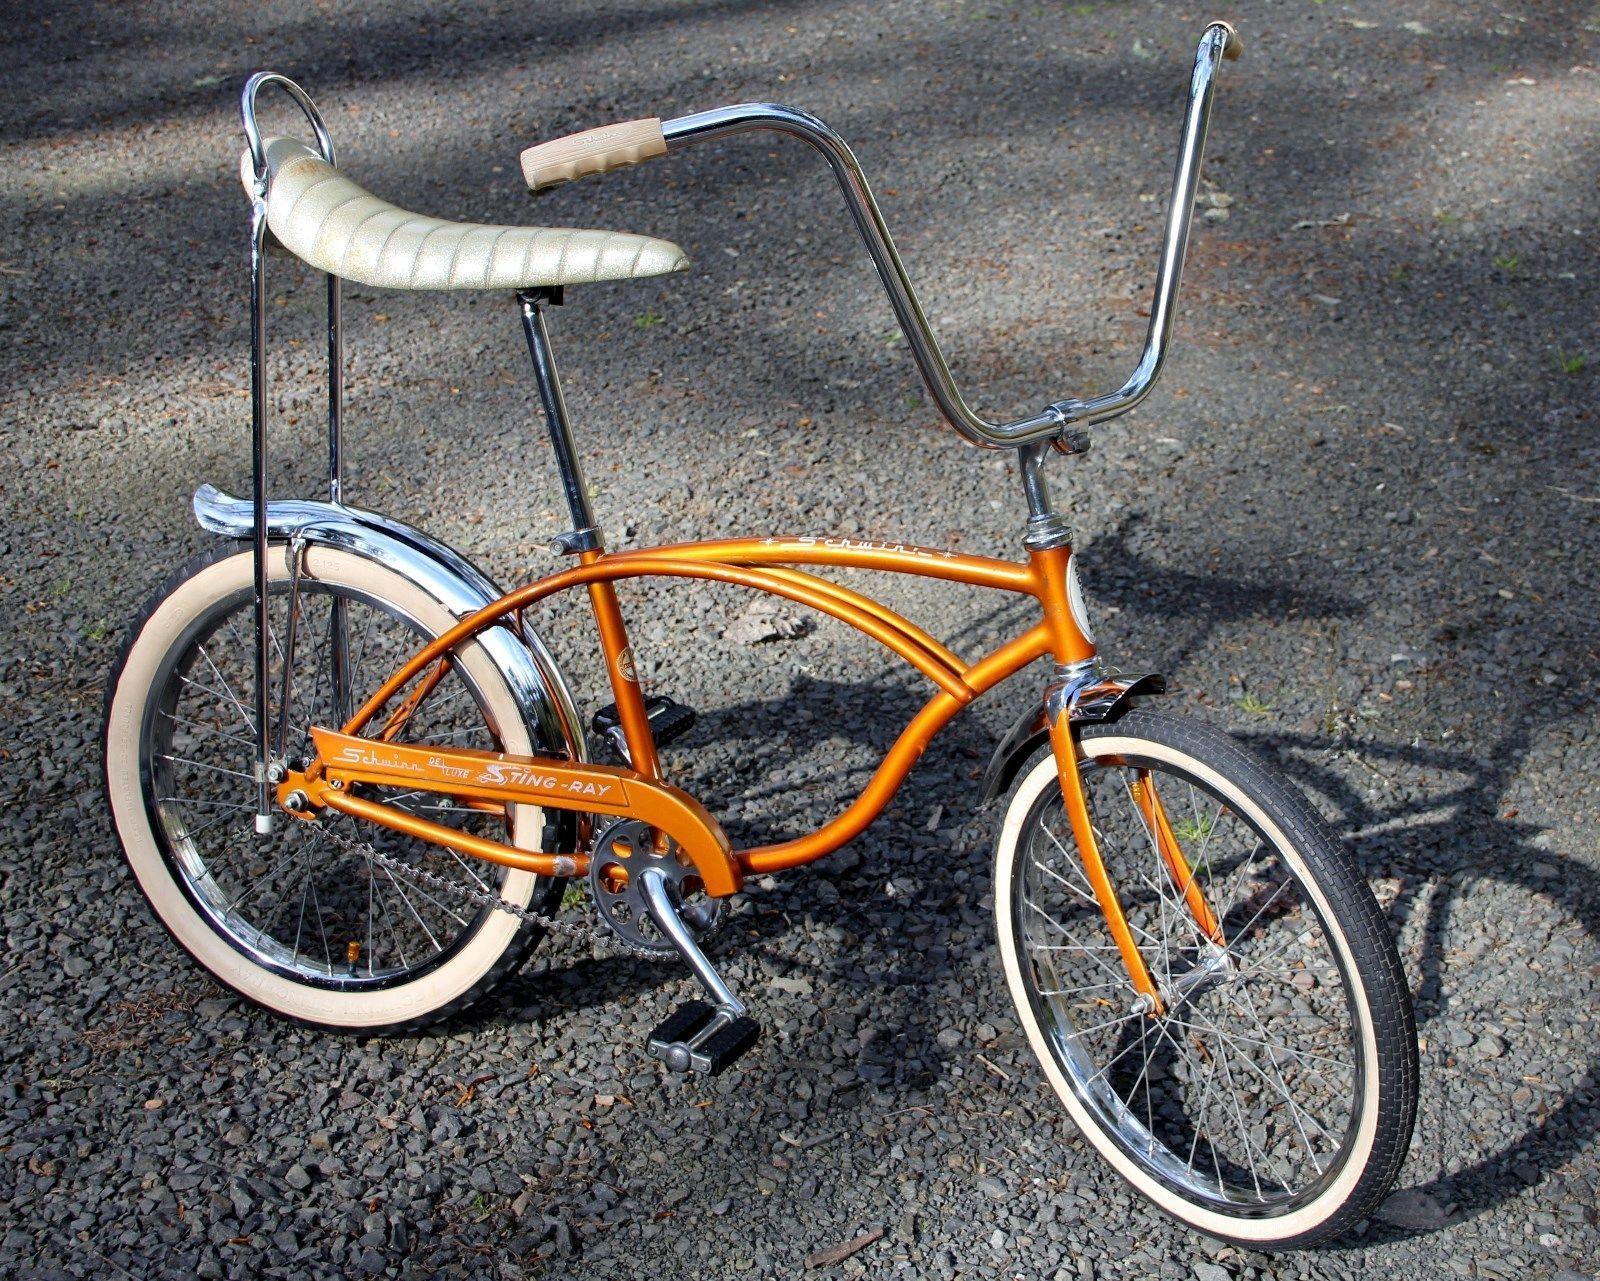 Original Paint Vintage 1966 Schwinn Coppertone J 39 Deluxe Stingray Bike S2  S7 | eBay